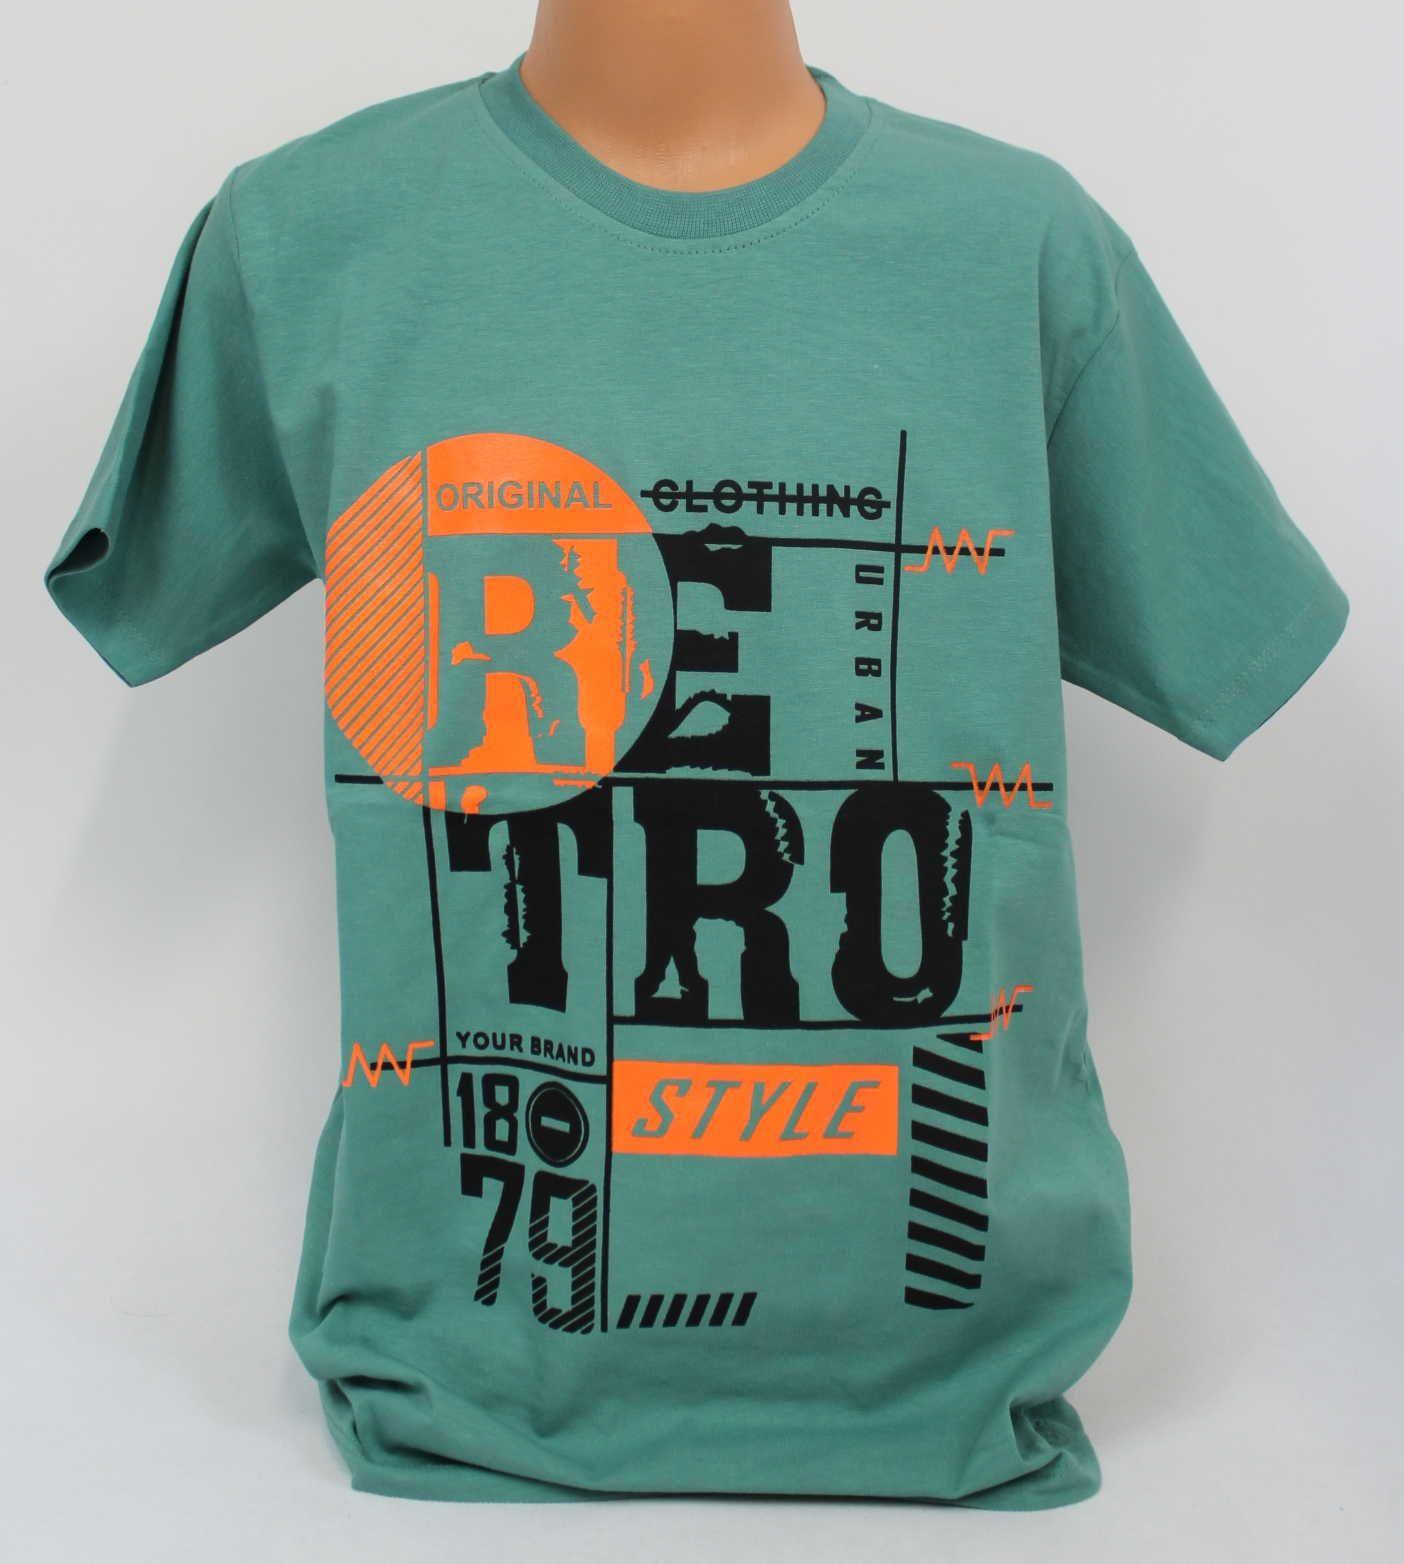 Triko krátký rukáv, bavlněné chlapecké tričko, mintové chlapecké tričko, triko krátký rukáv kluk, chlapecké triko